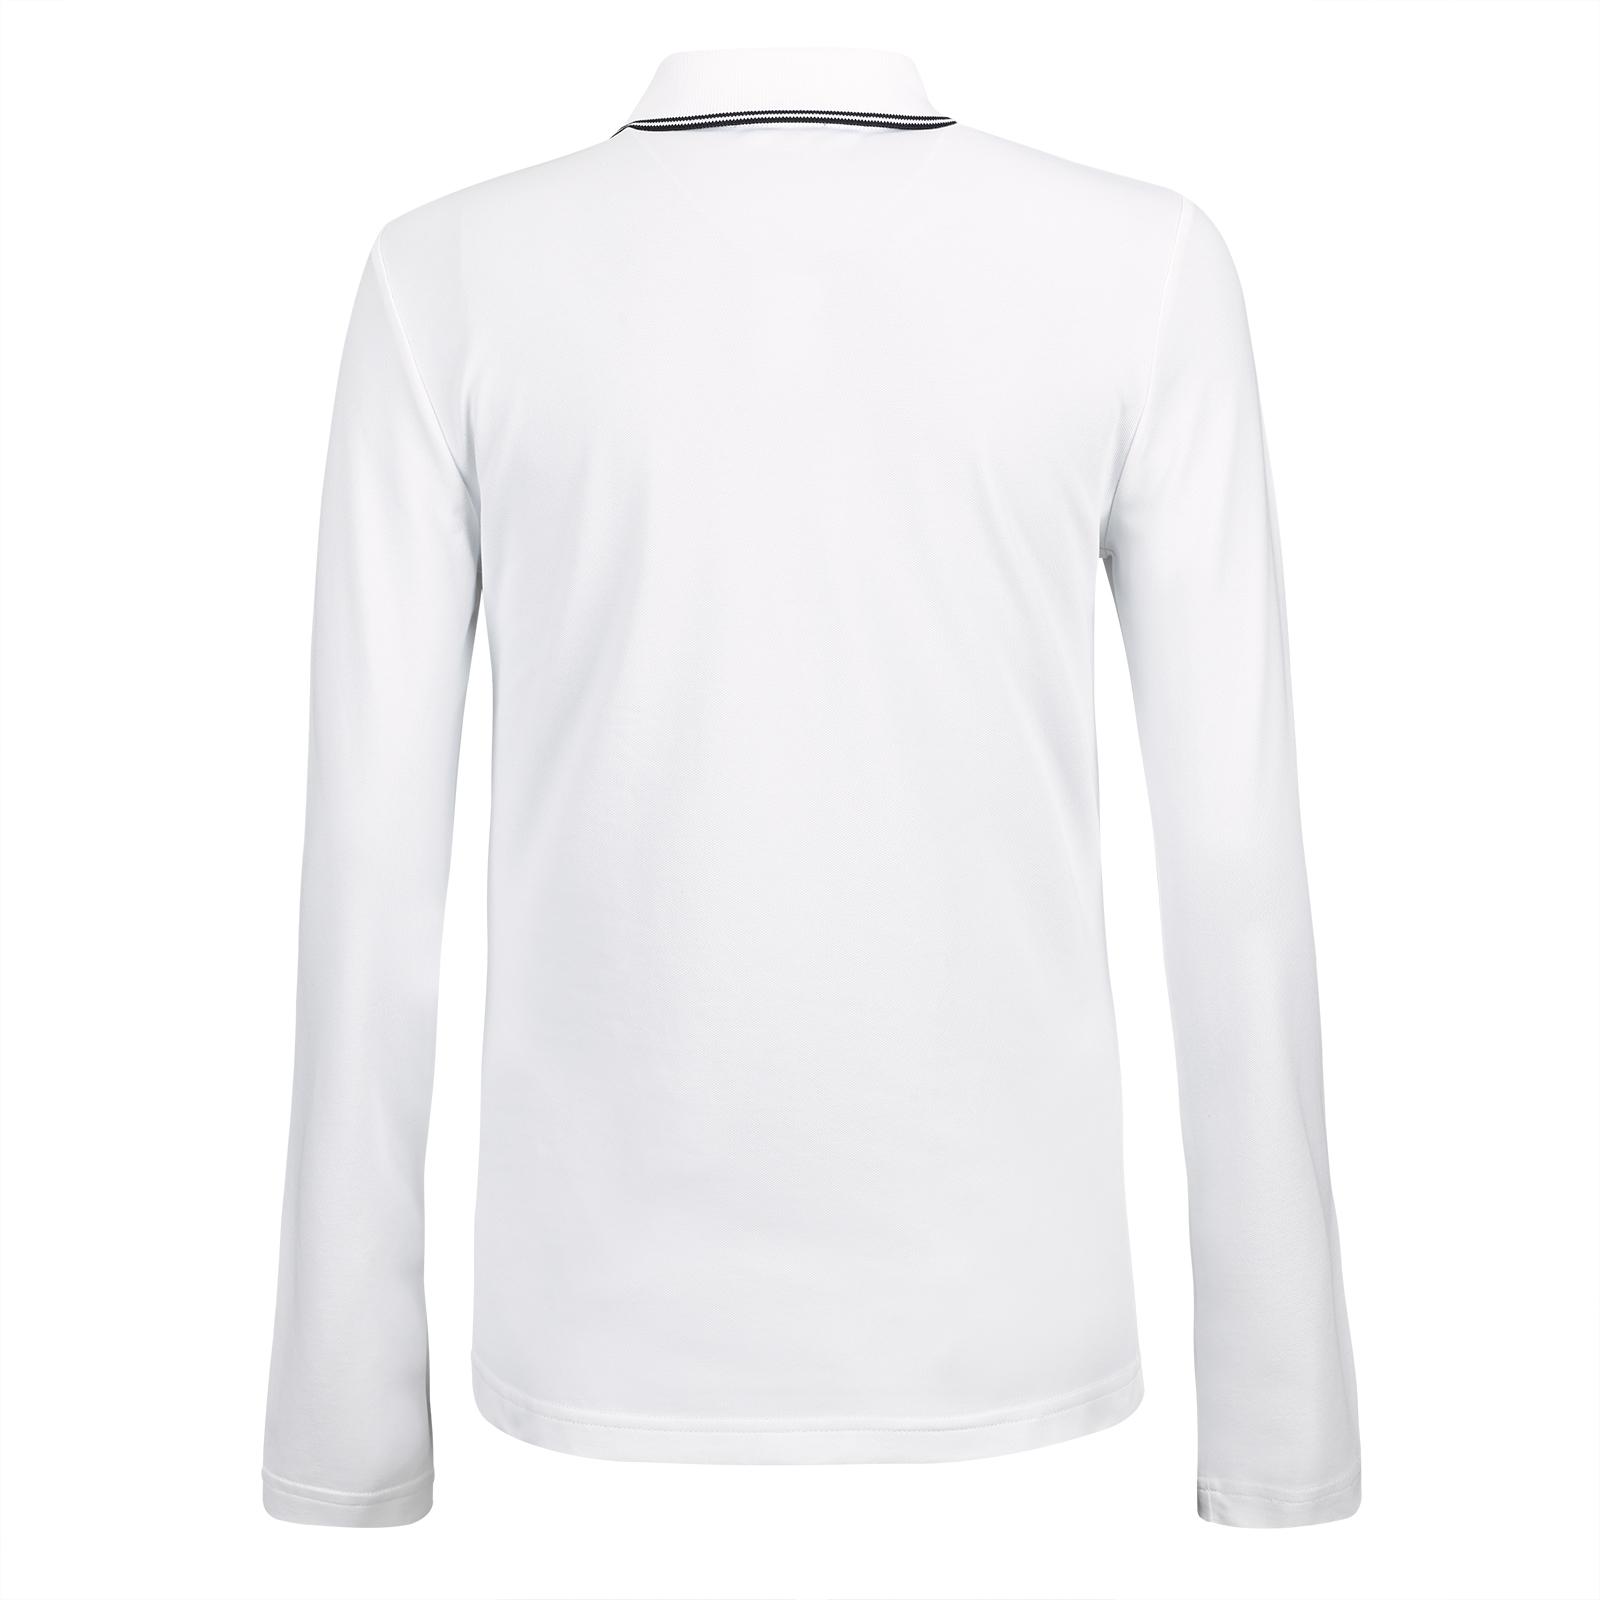 Damen langarm Basic Golfpoloshirt mit UV-Schutz Funktion